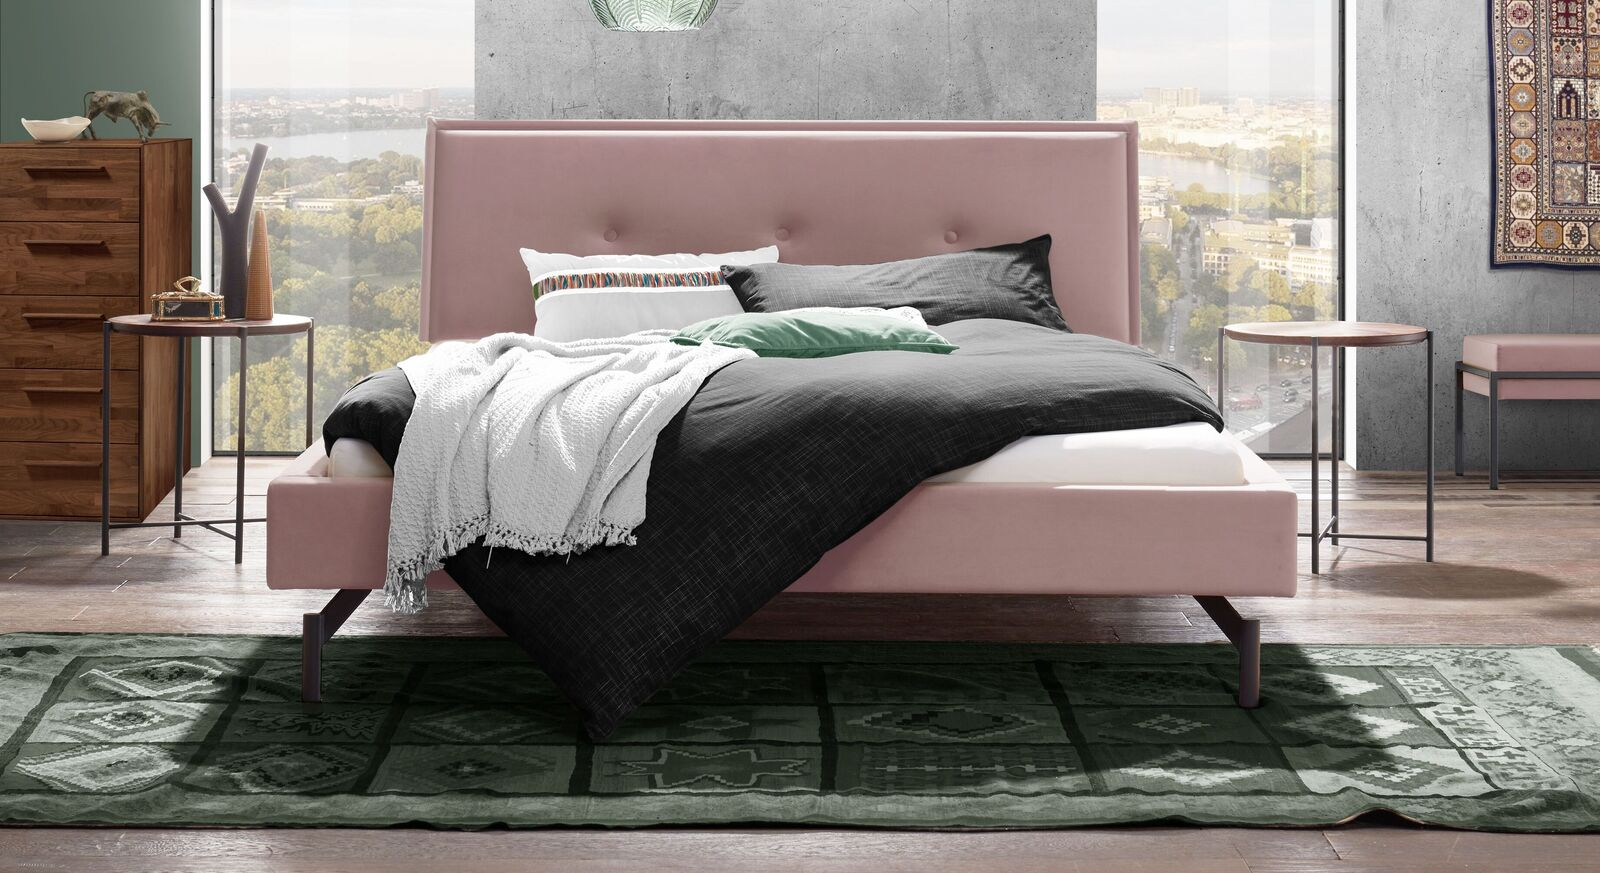 Extravagantes Bett Nocan mit blushfarbenem Samtbezug